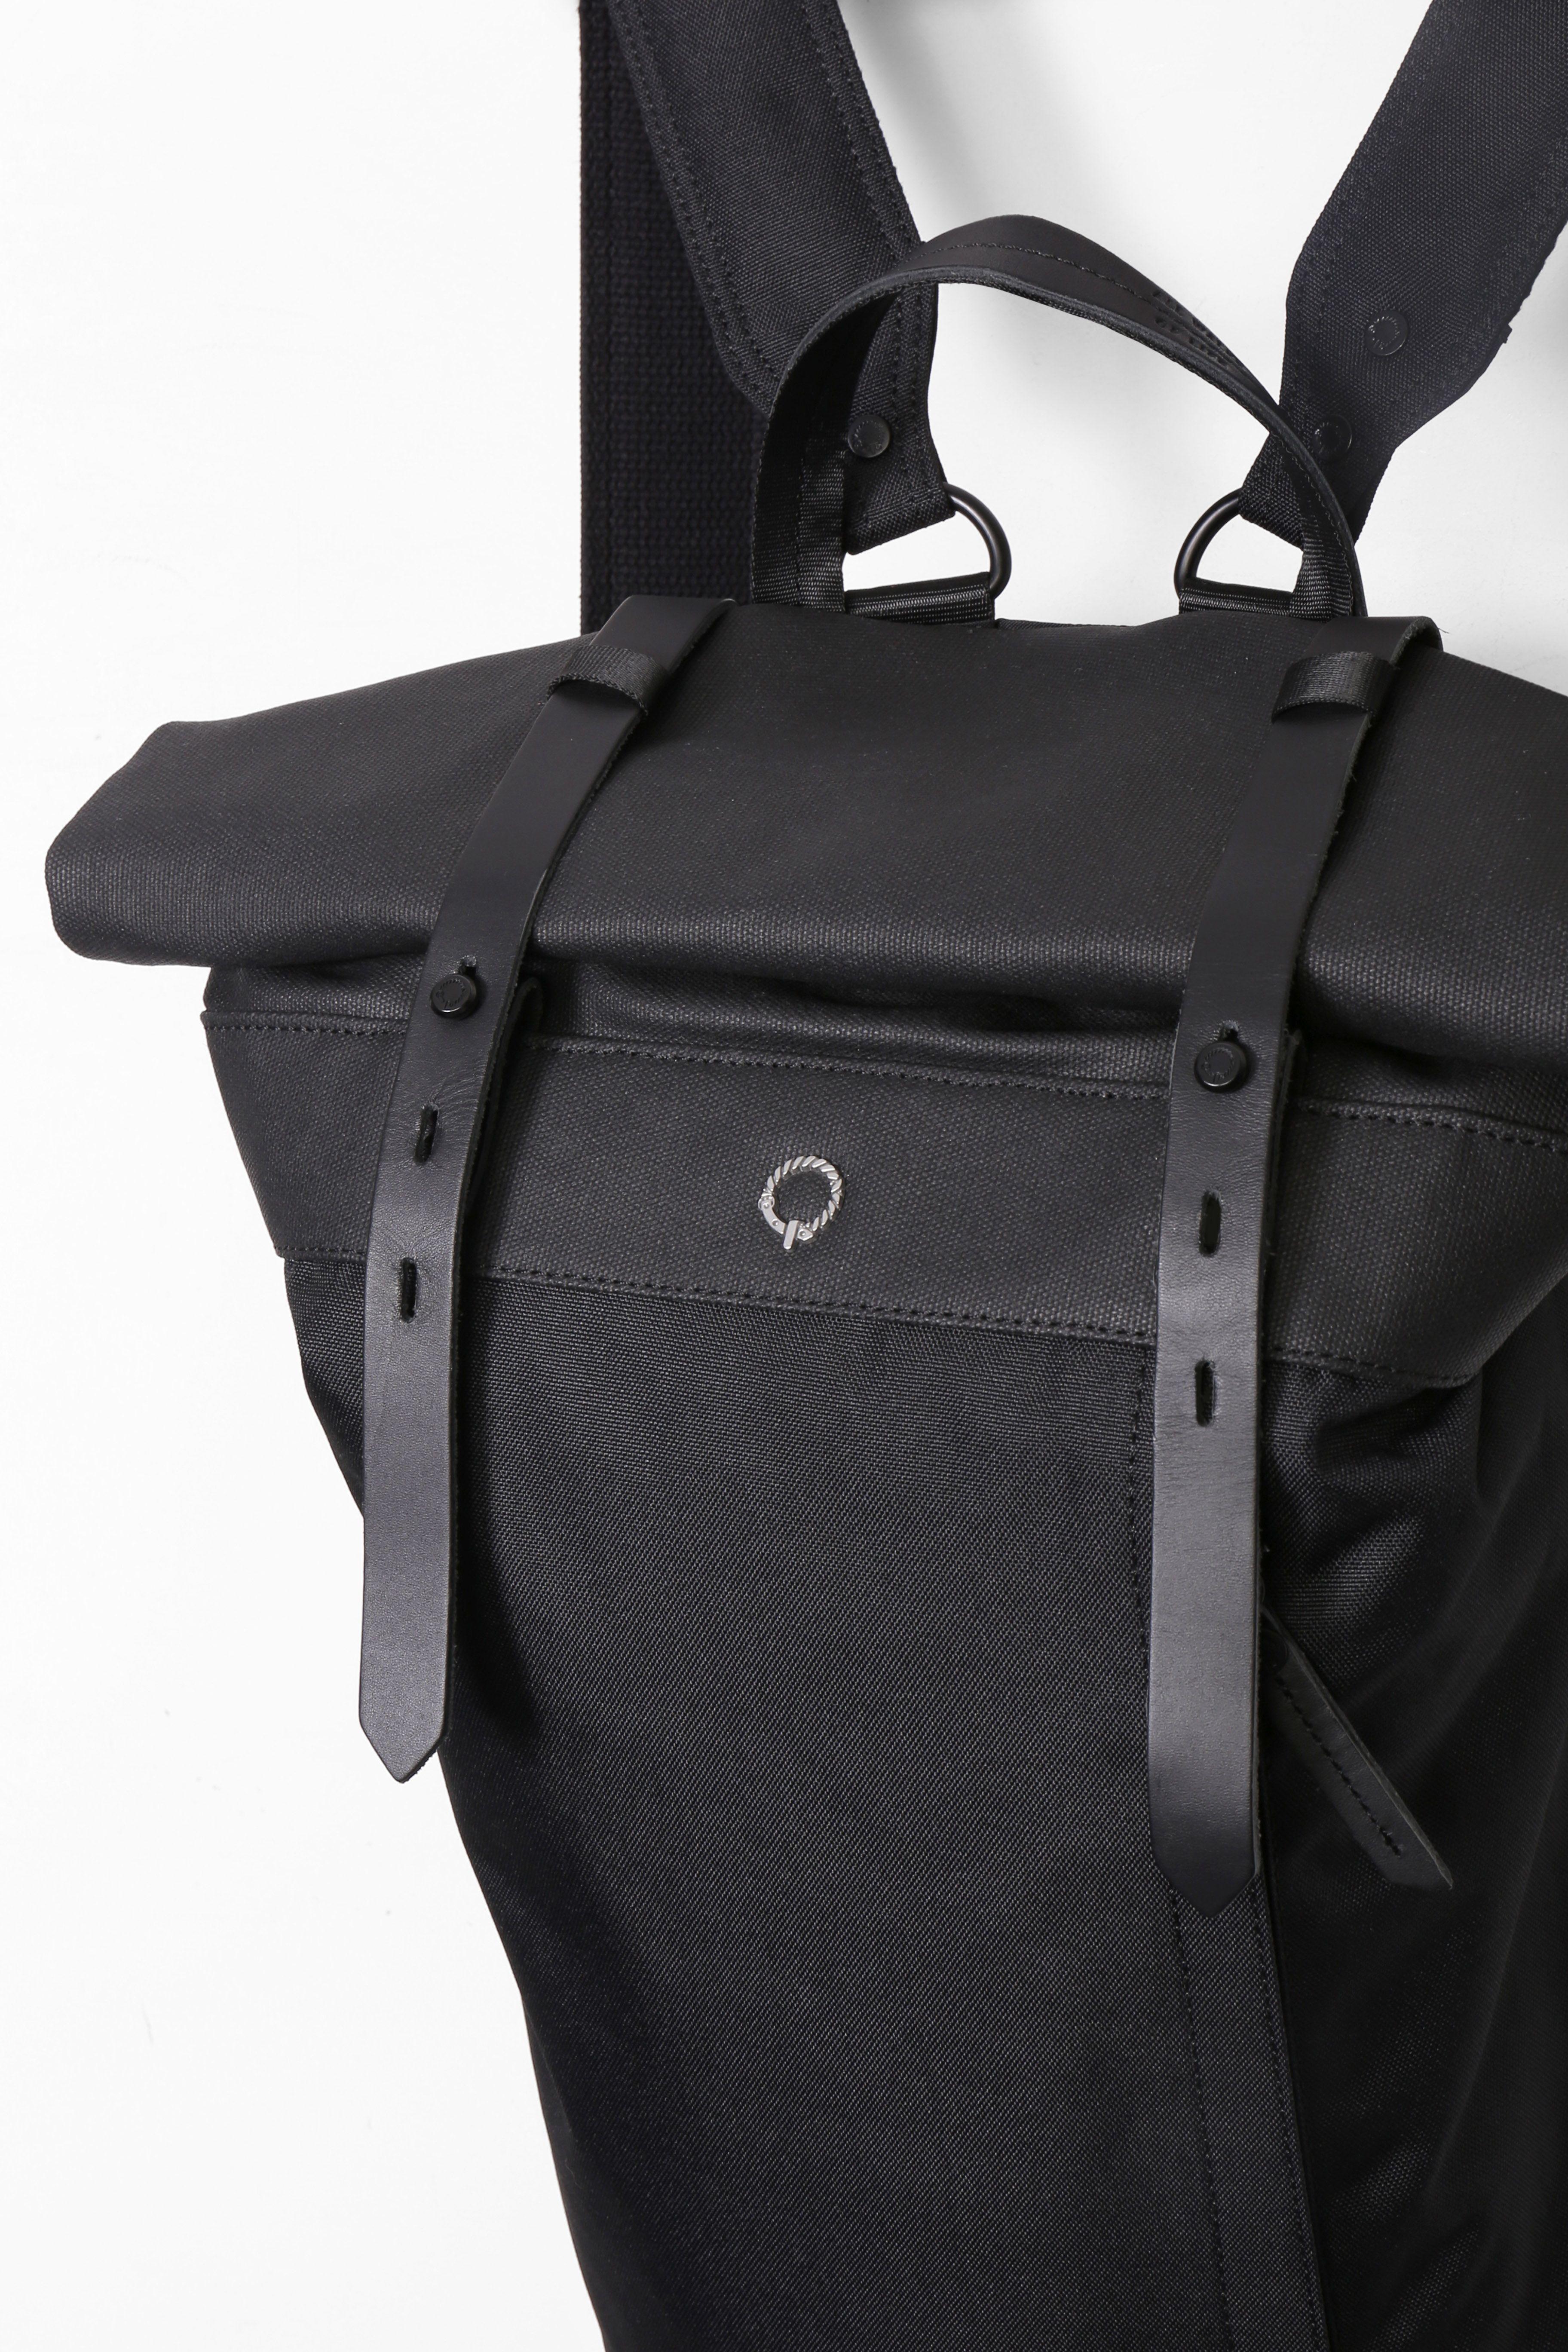 7a9d40407522 Stighlorgan Rori laptop rolltop backpack